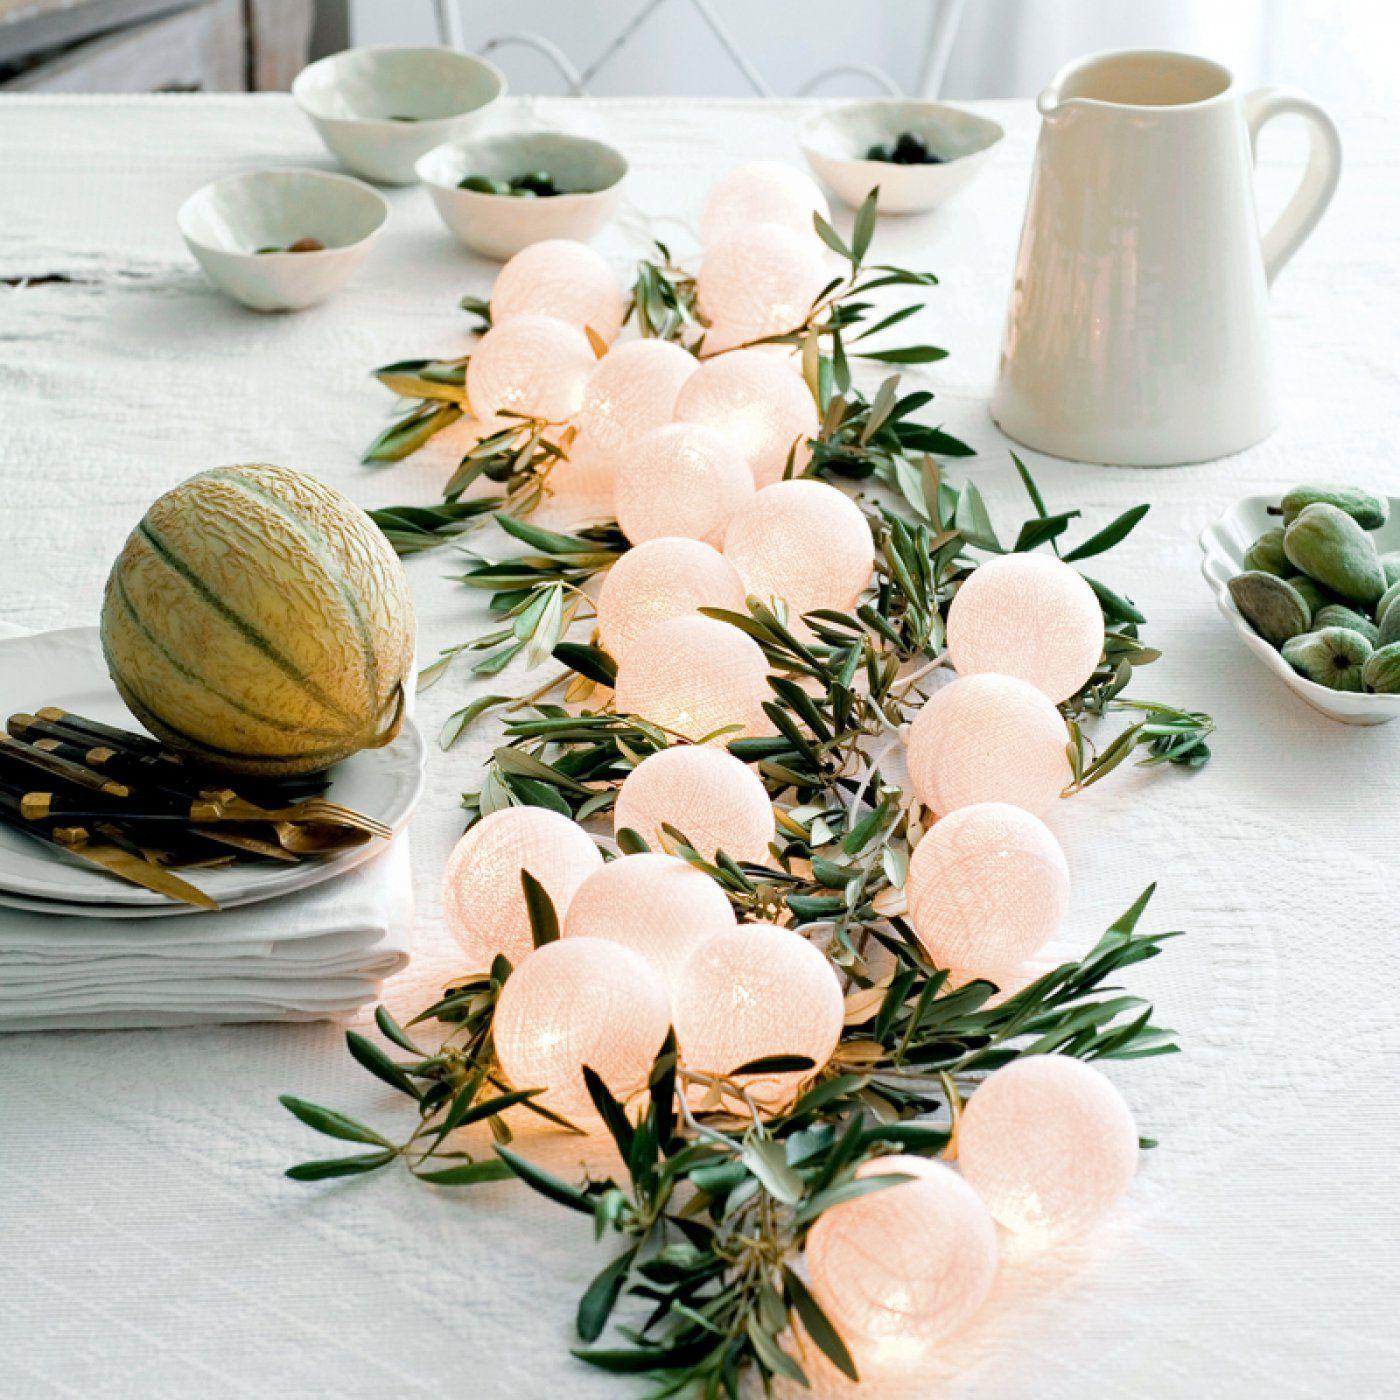 une guirlande lumineuse orn e de branches d olivier mariage m pinterest fiesta ibicenca. Black Bedroom Furniture Sets. Home Design Ideas